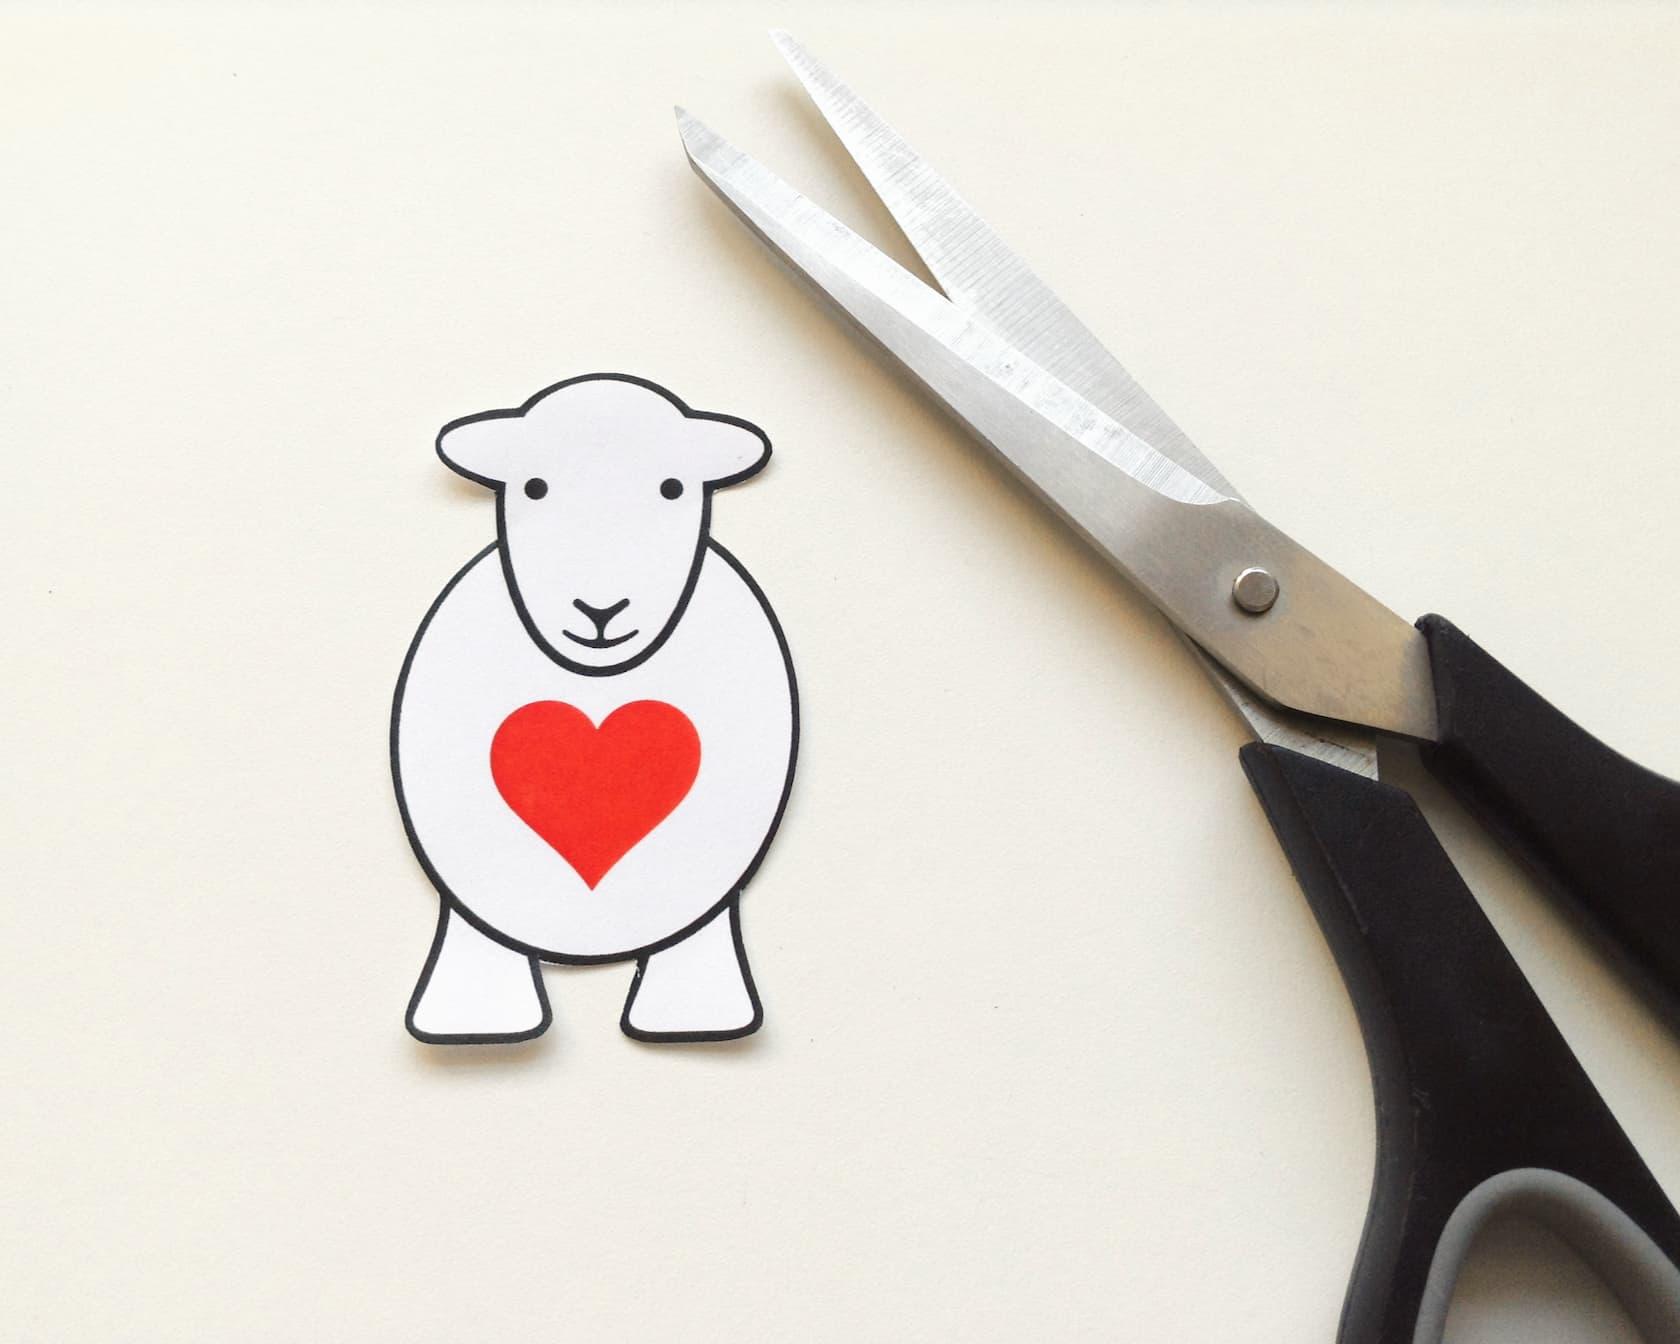 Cut out the Herdy Yan Love Ewe shape